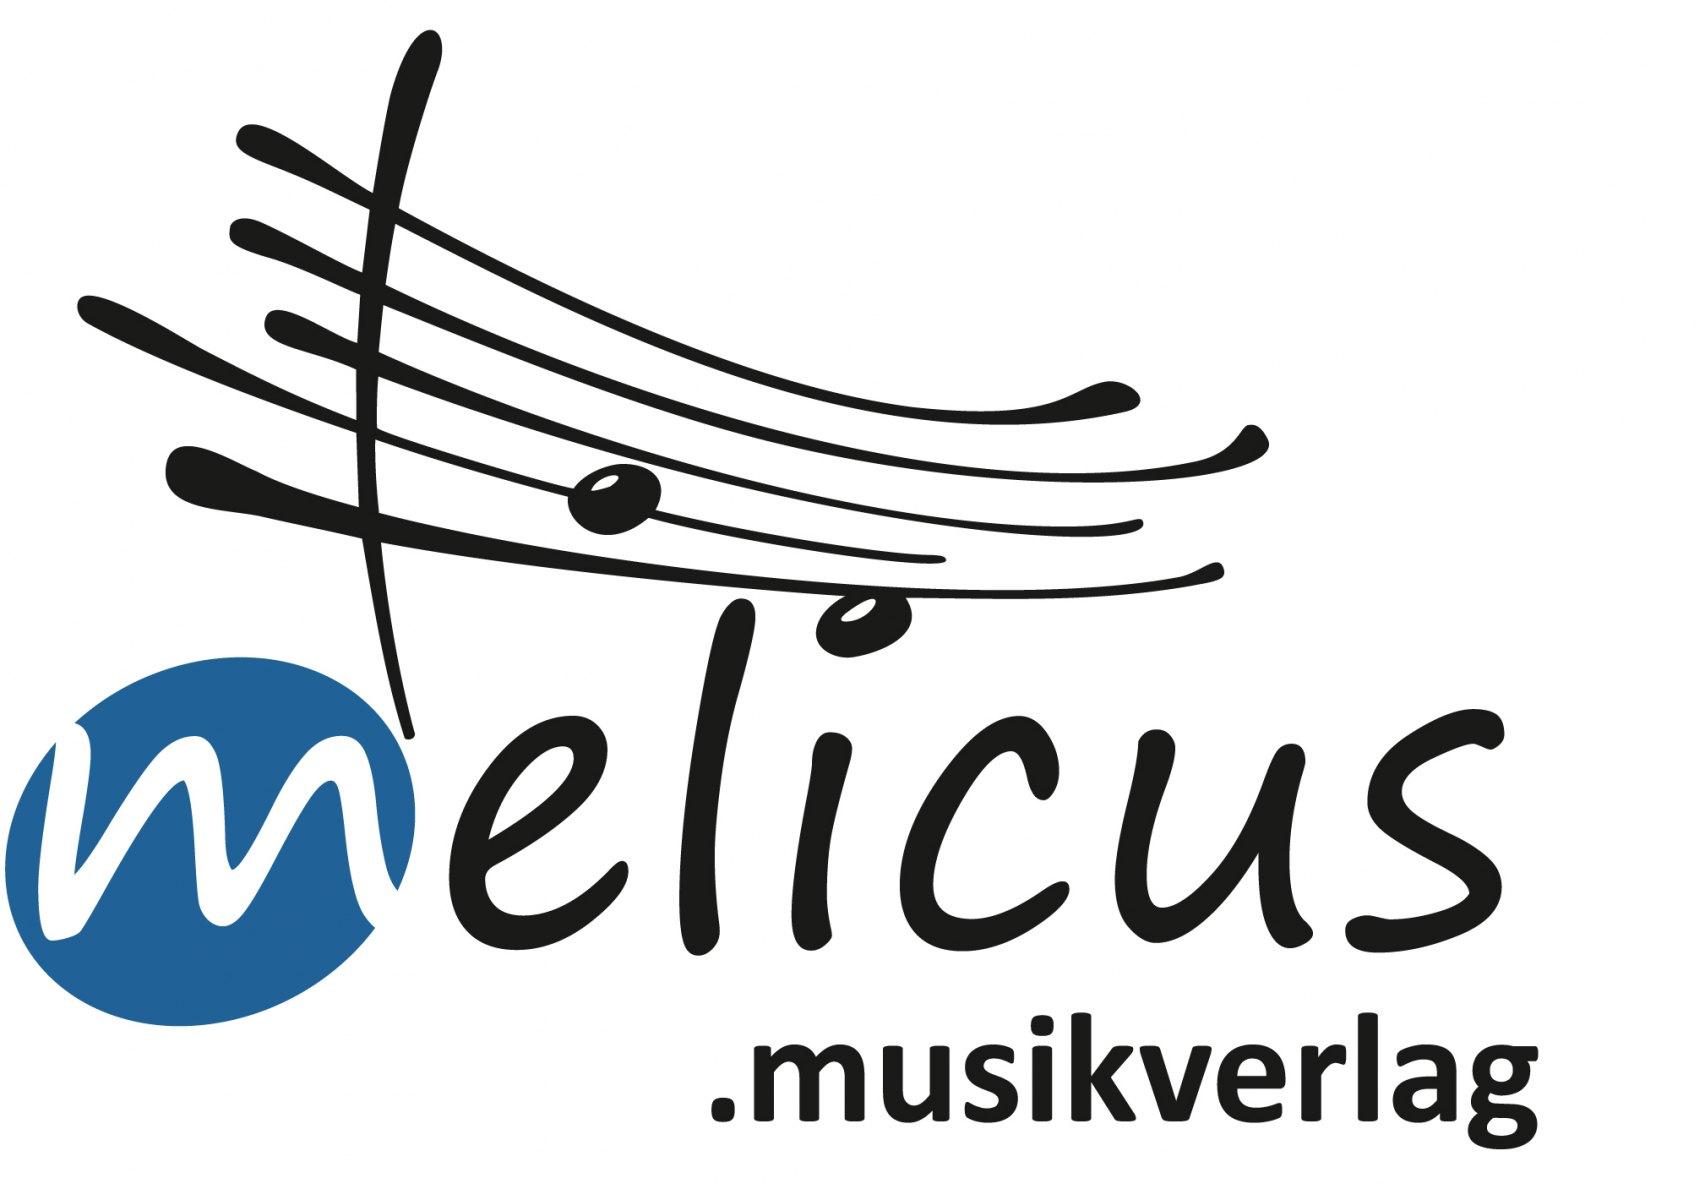 melicus-musikverlag.cdr